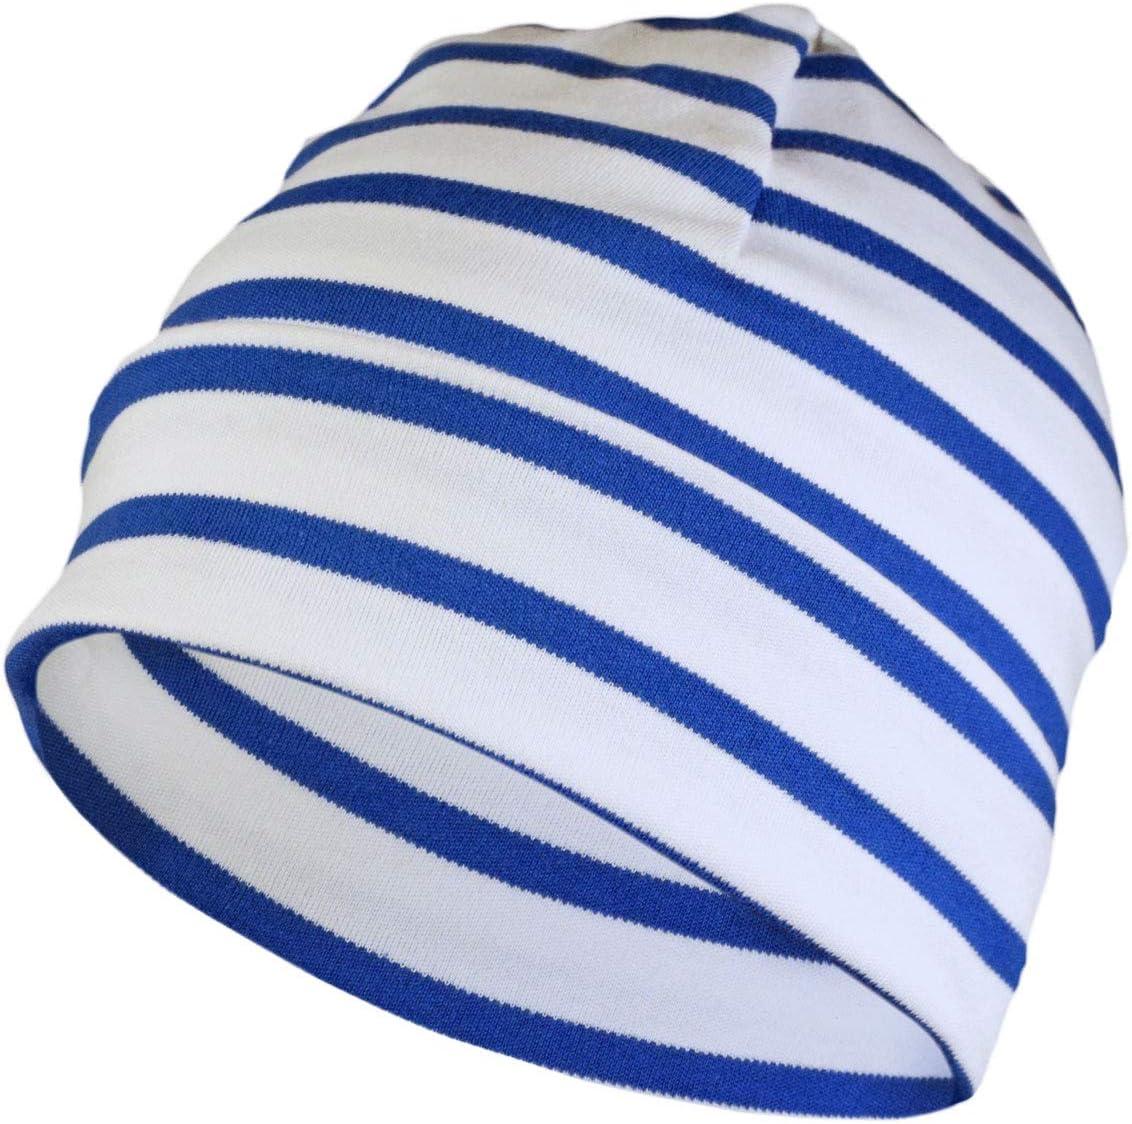 Modas Bonnet Breton Couleur:wei/ß//blau Taille/:3